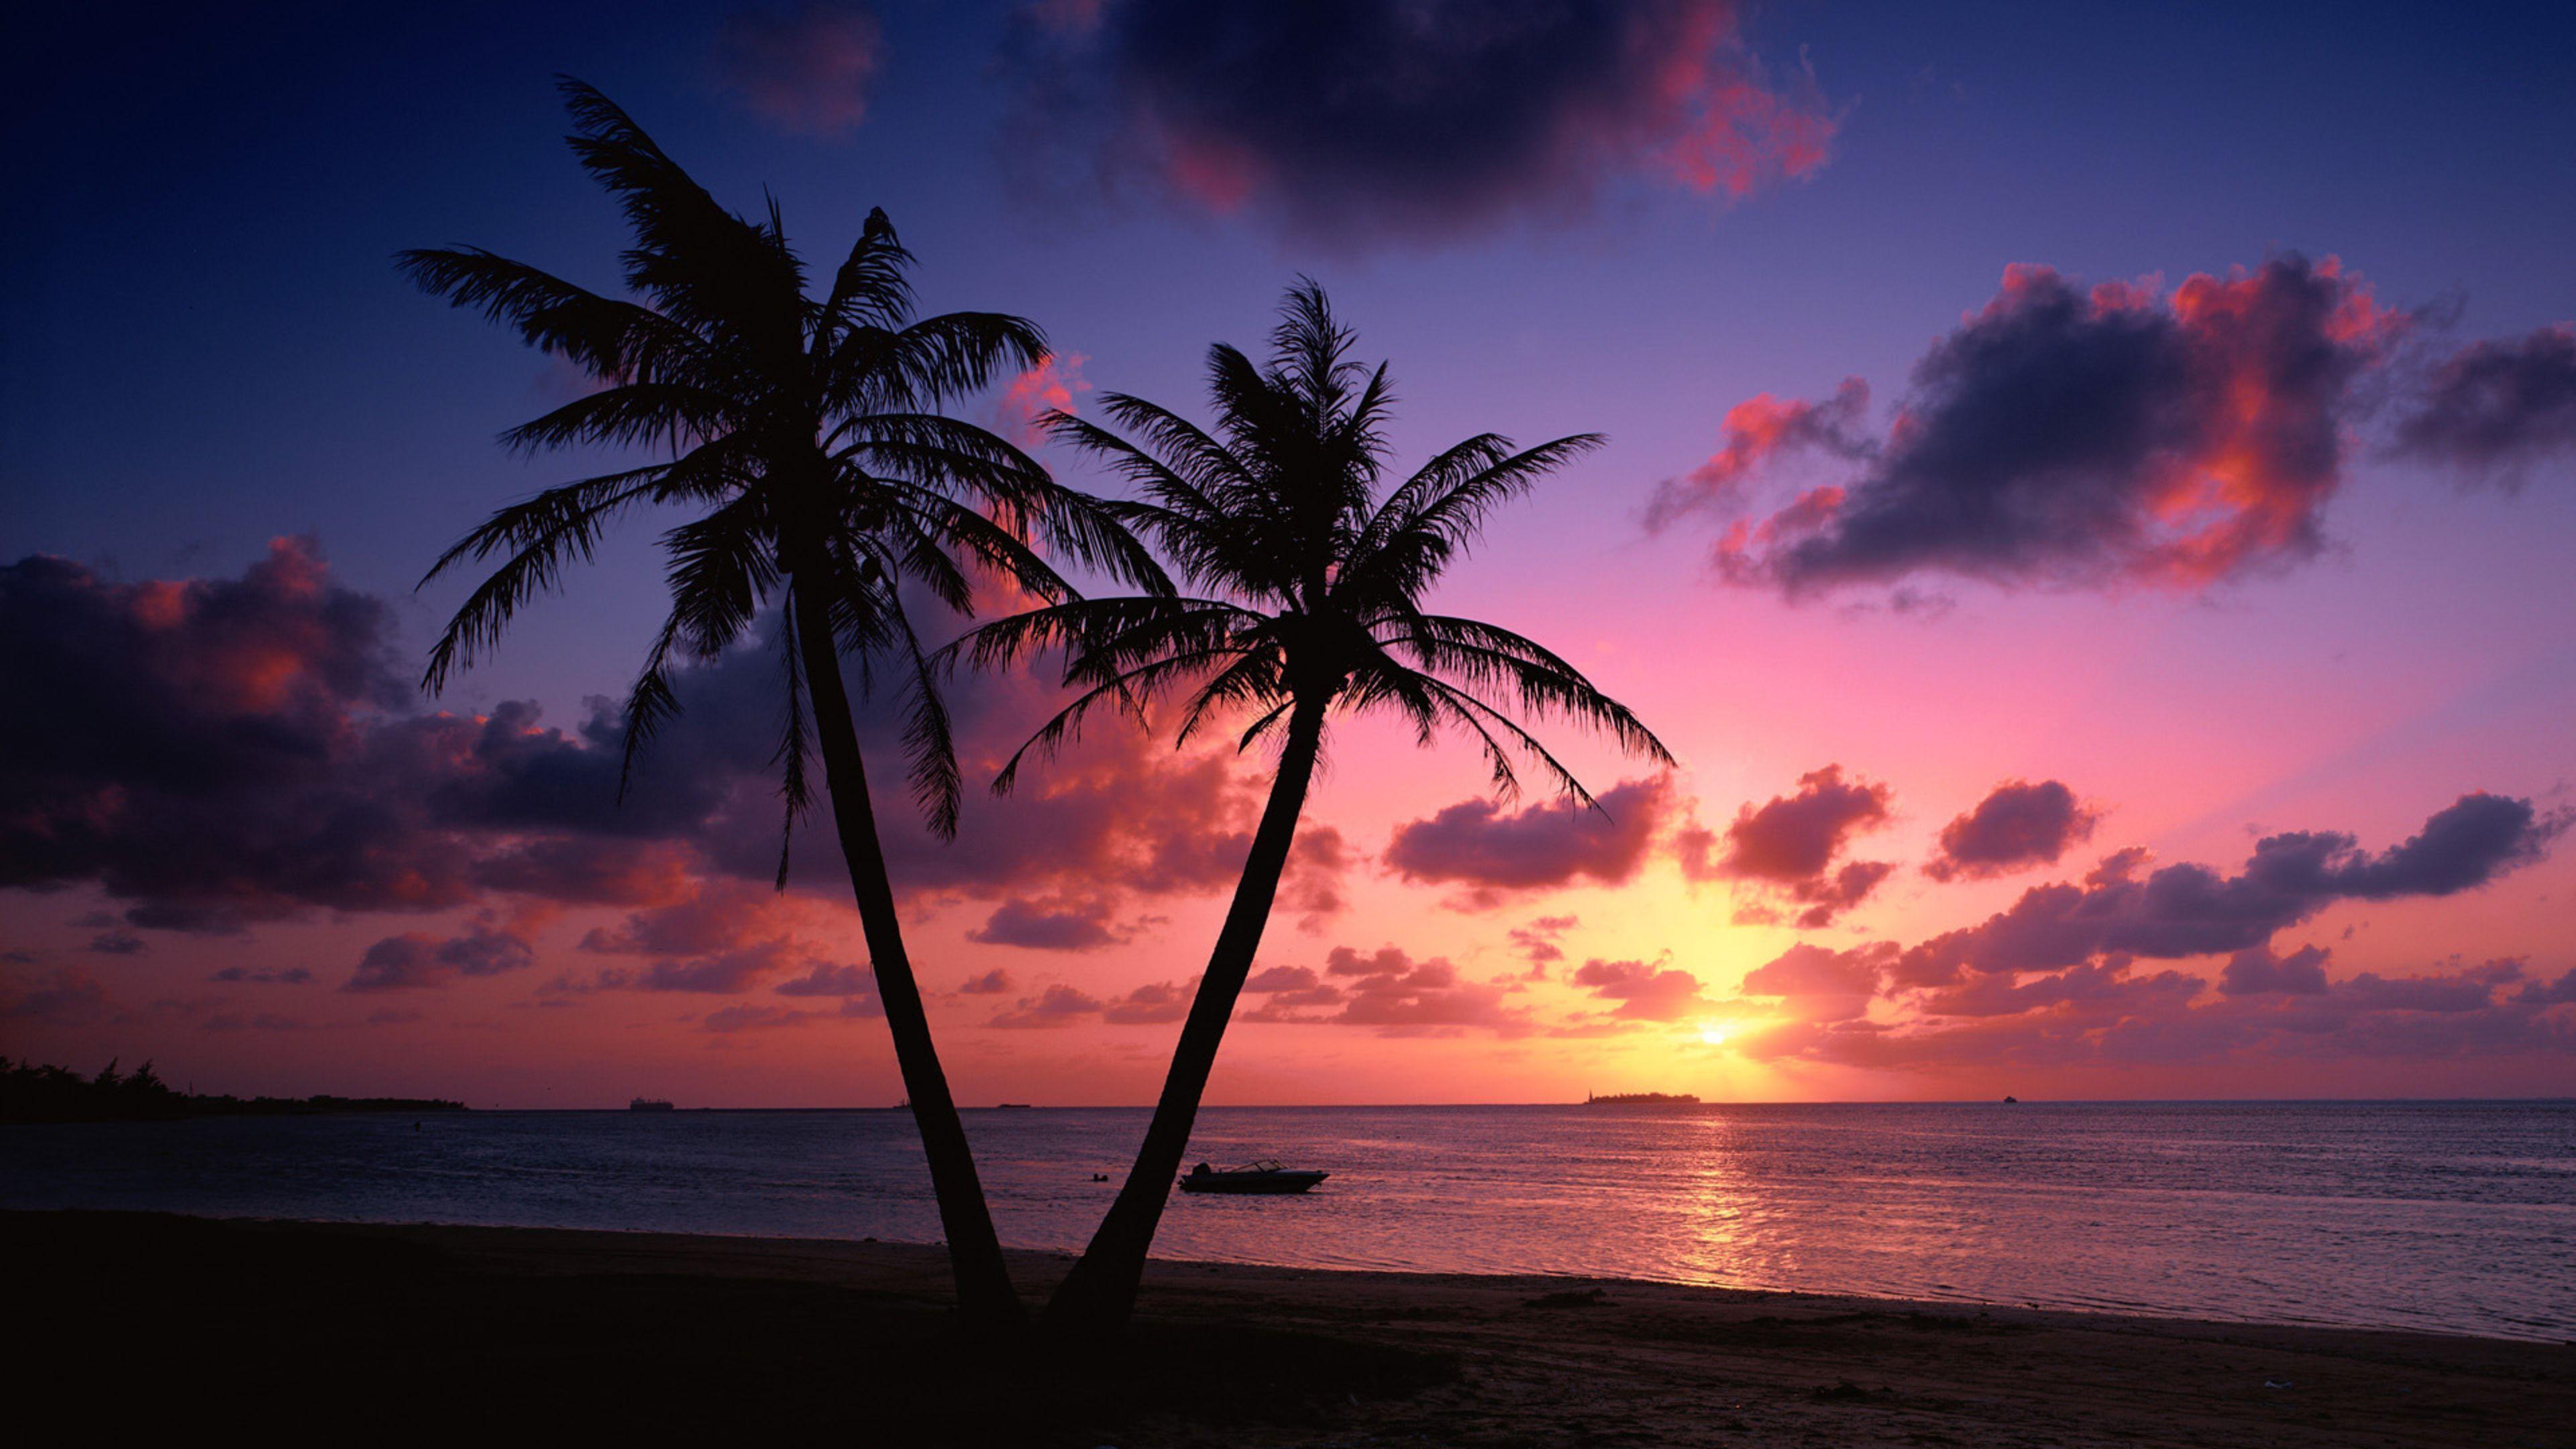 3840x2160 Romatic Beach 4k Sunset Wallpaper Free 4k Wallpaper